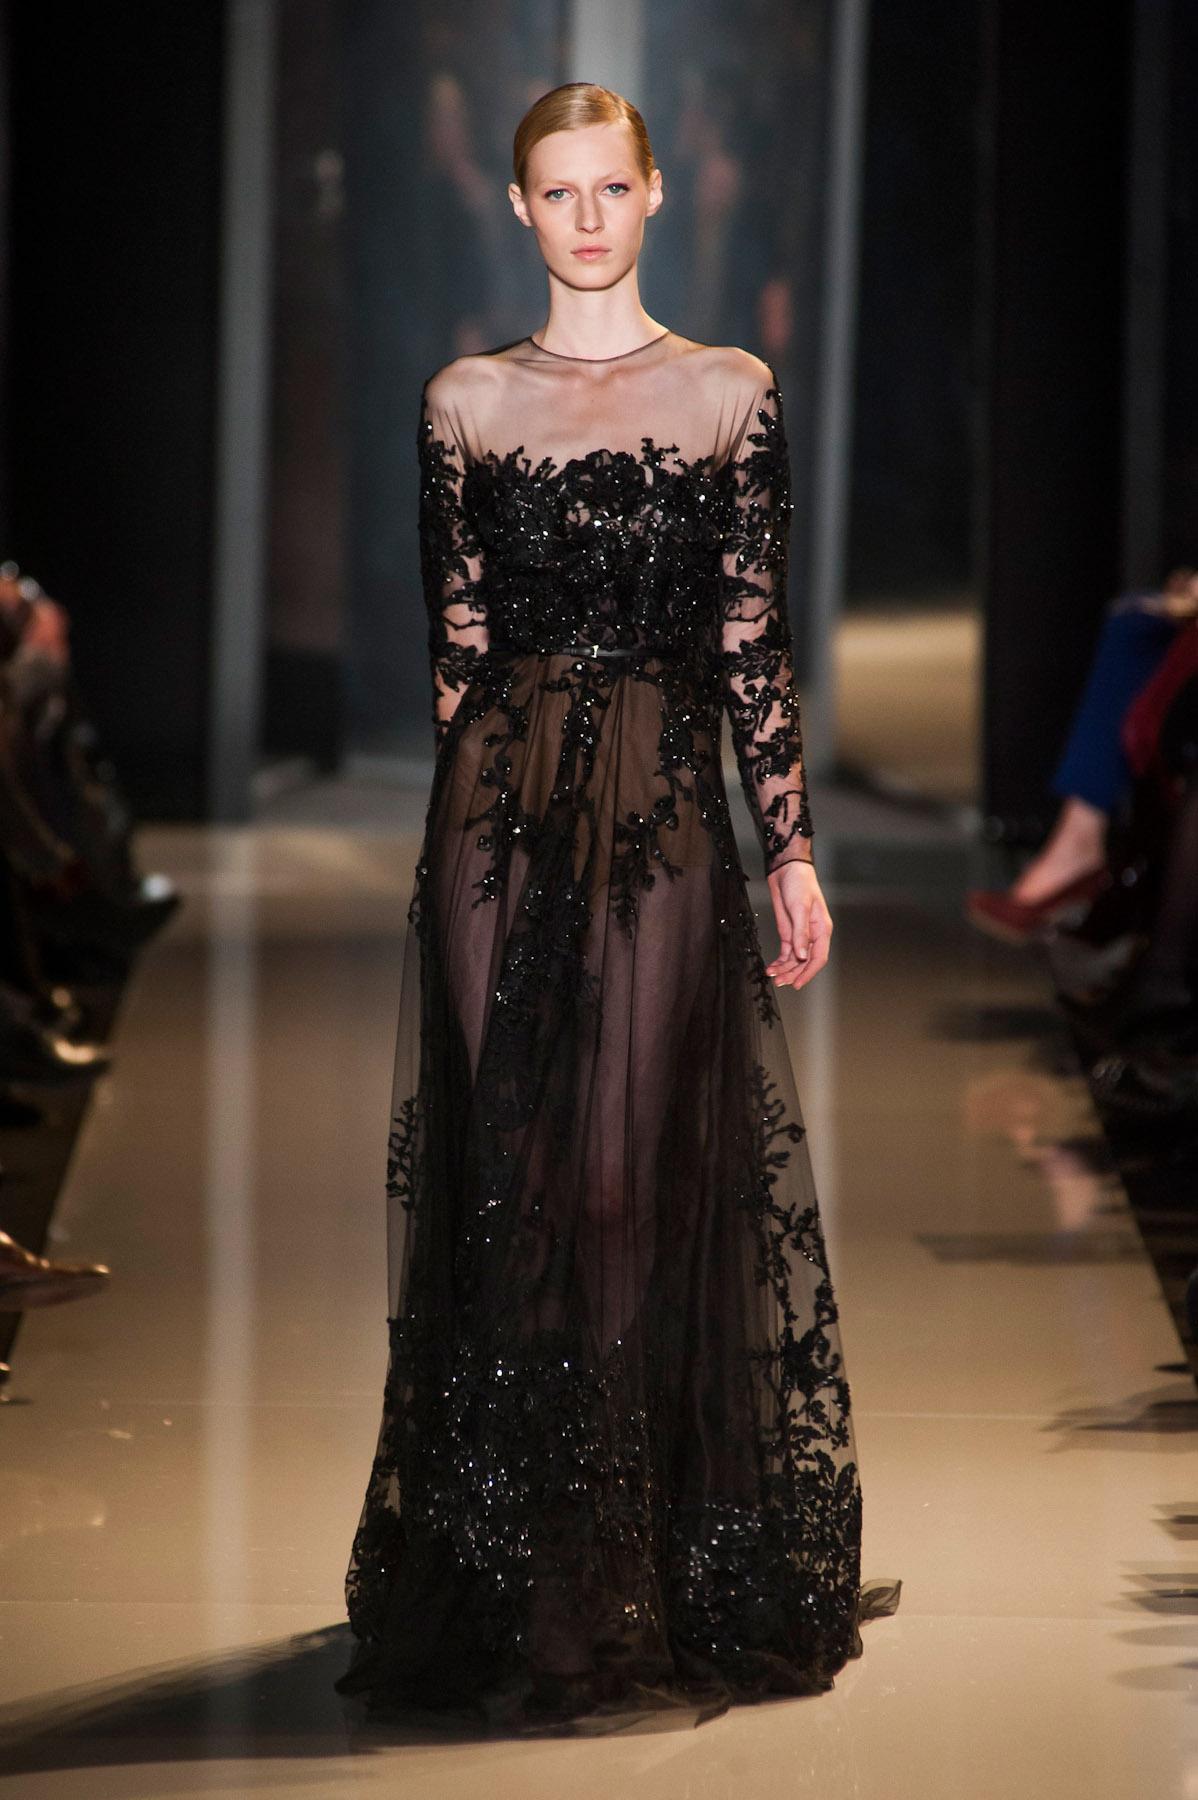 Elie Saab Fall 2013 Couture Runway - elle.com